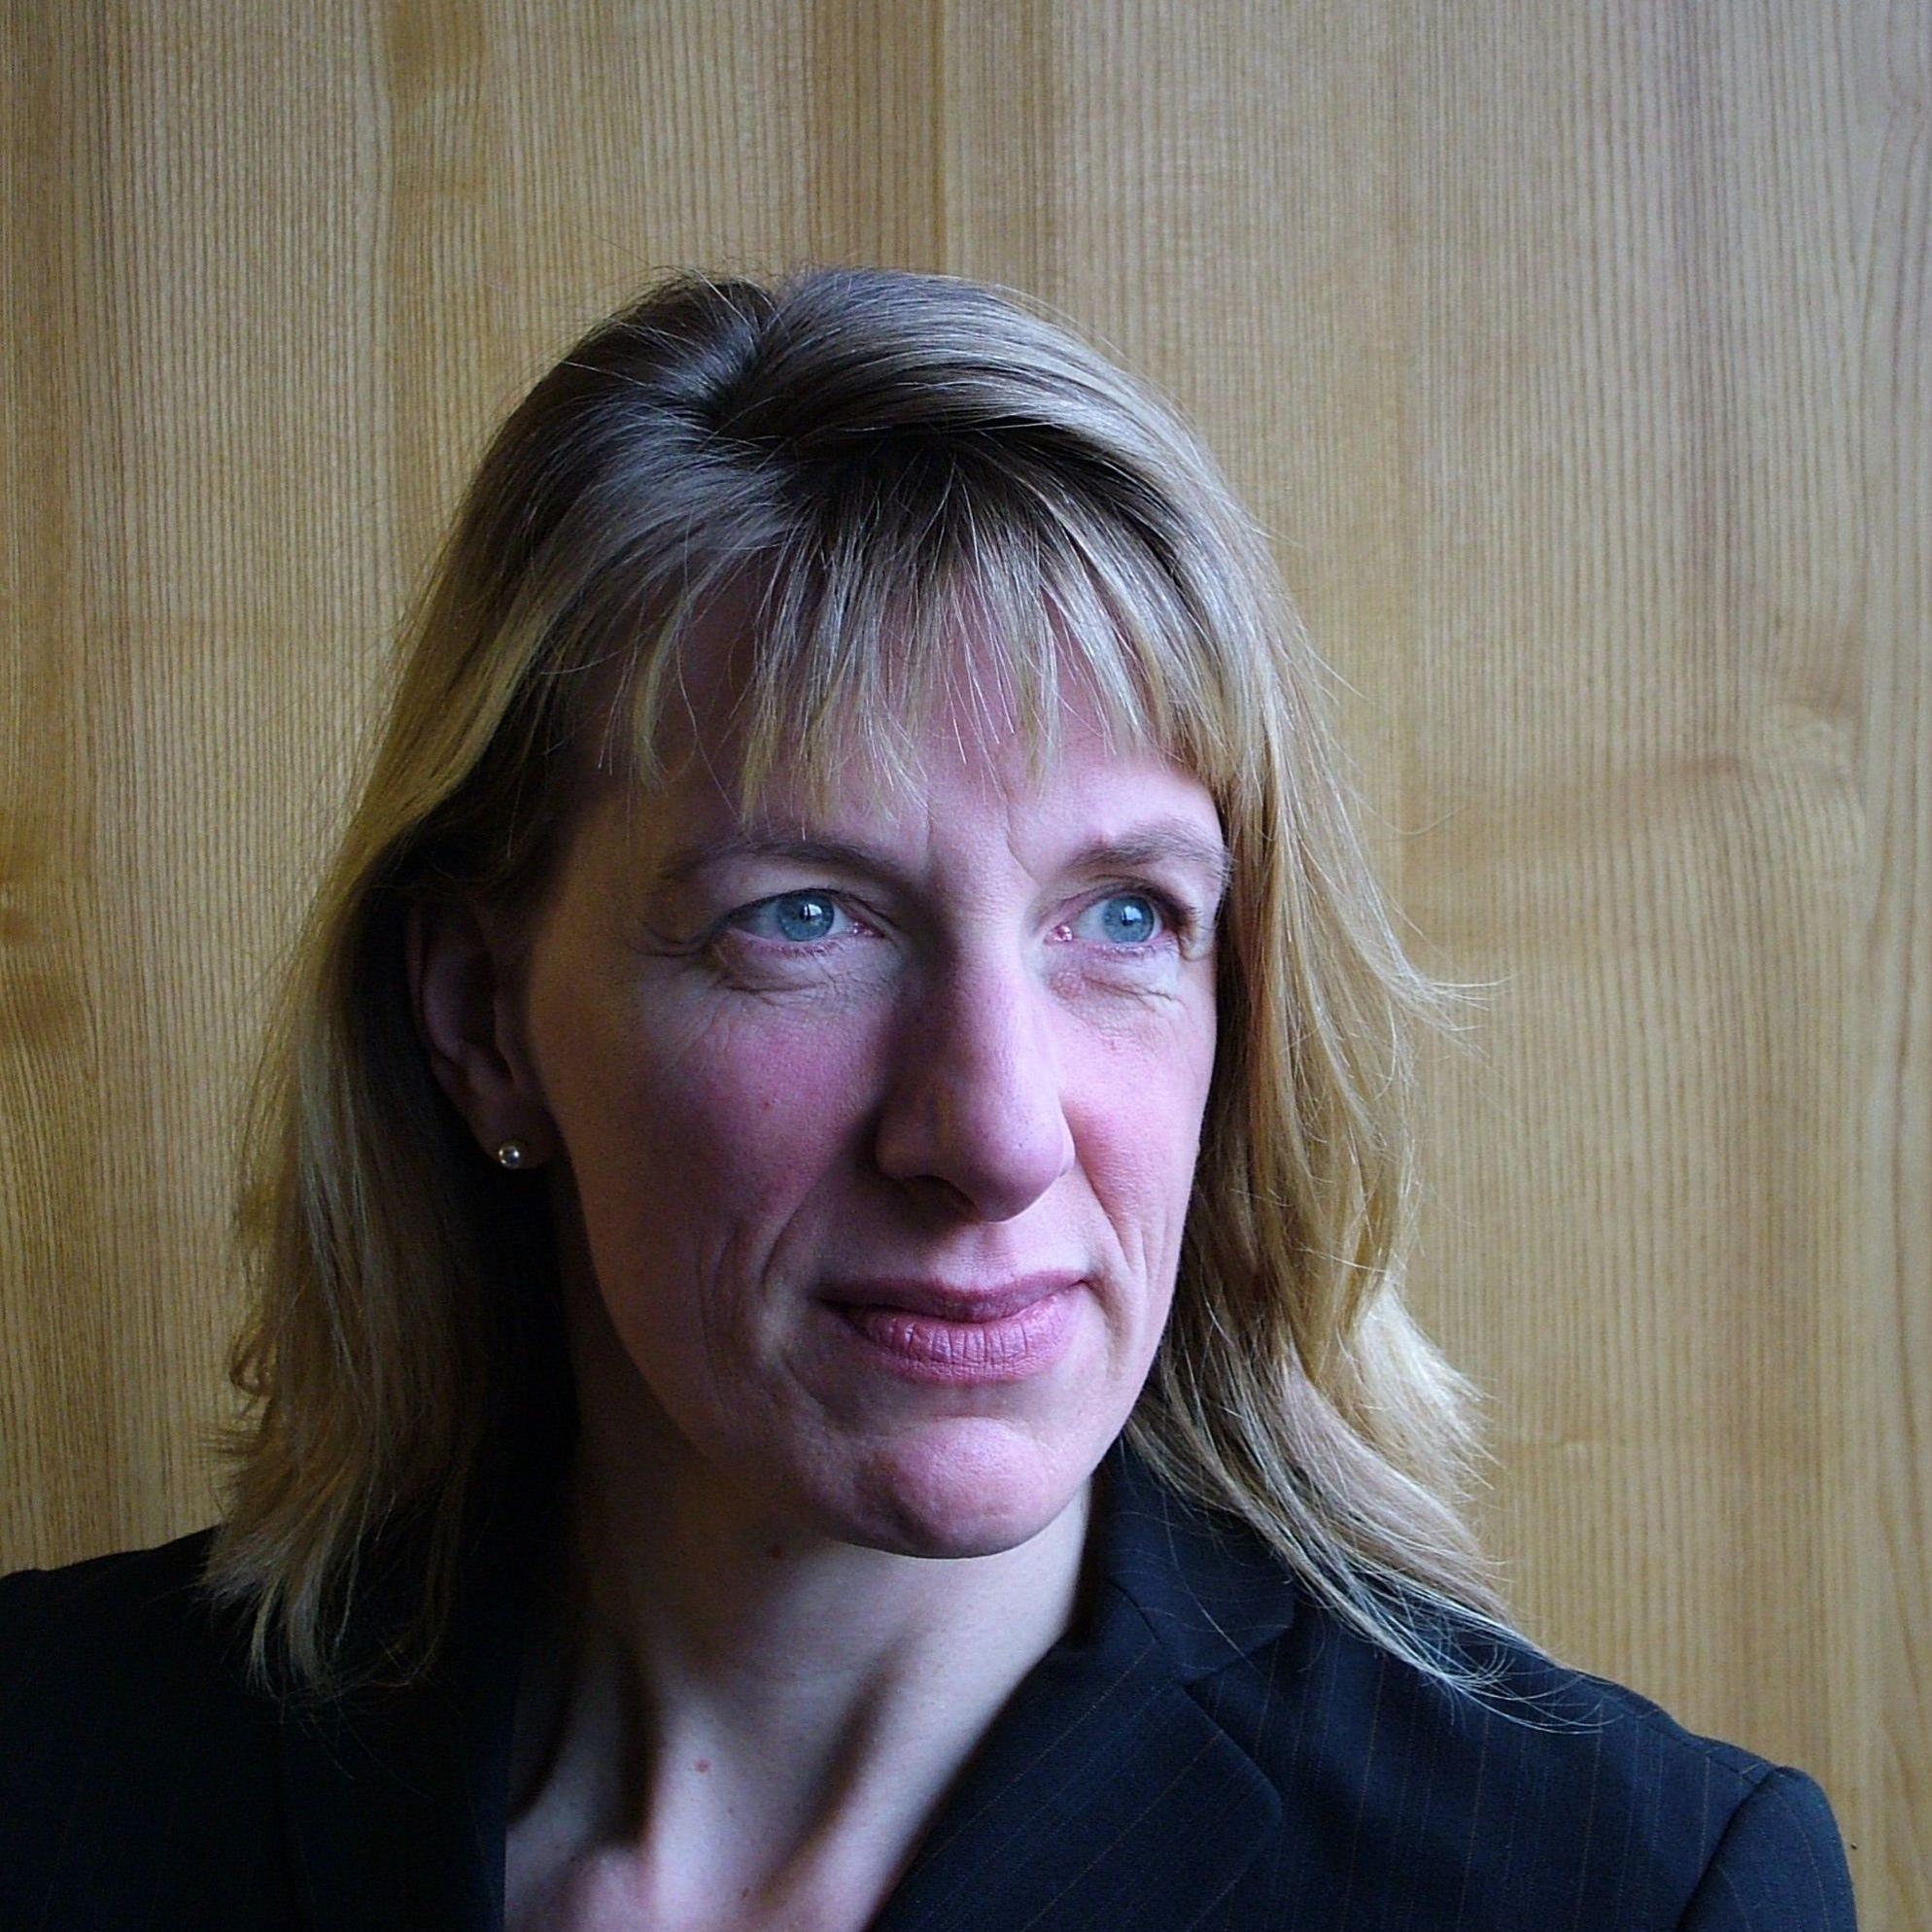 Rechtsanwältin Irene Sommer Kanzlei Irene Sommer 13597 Berlin